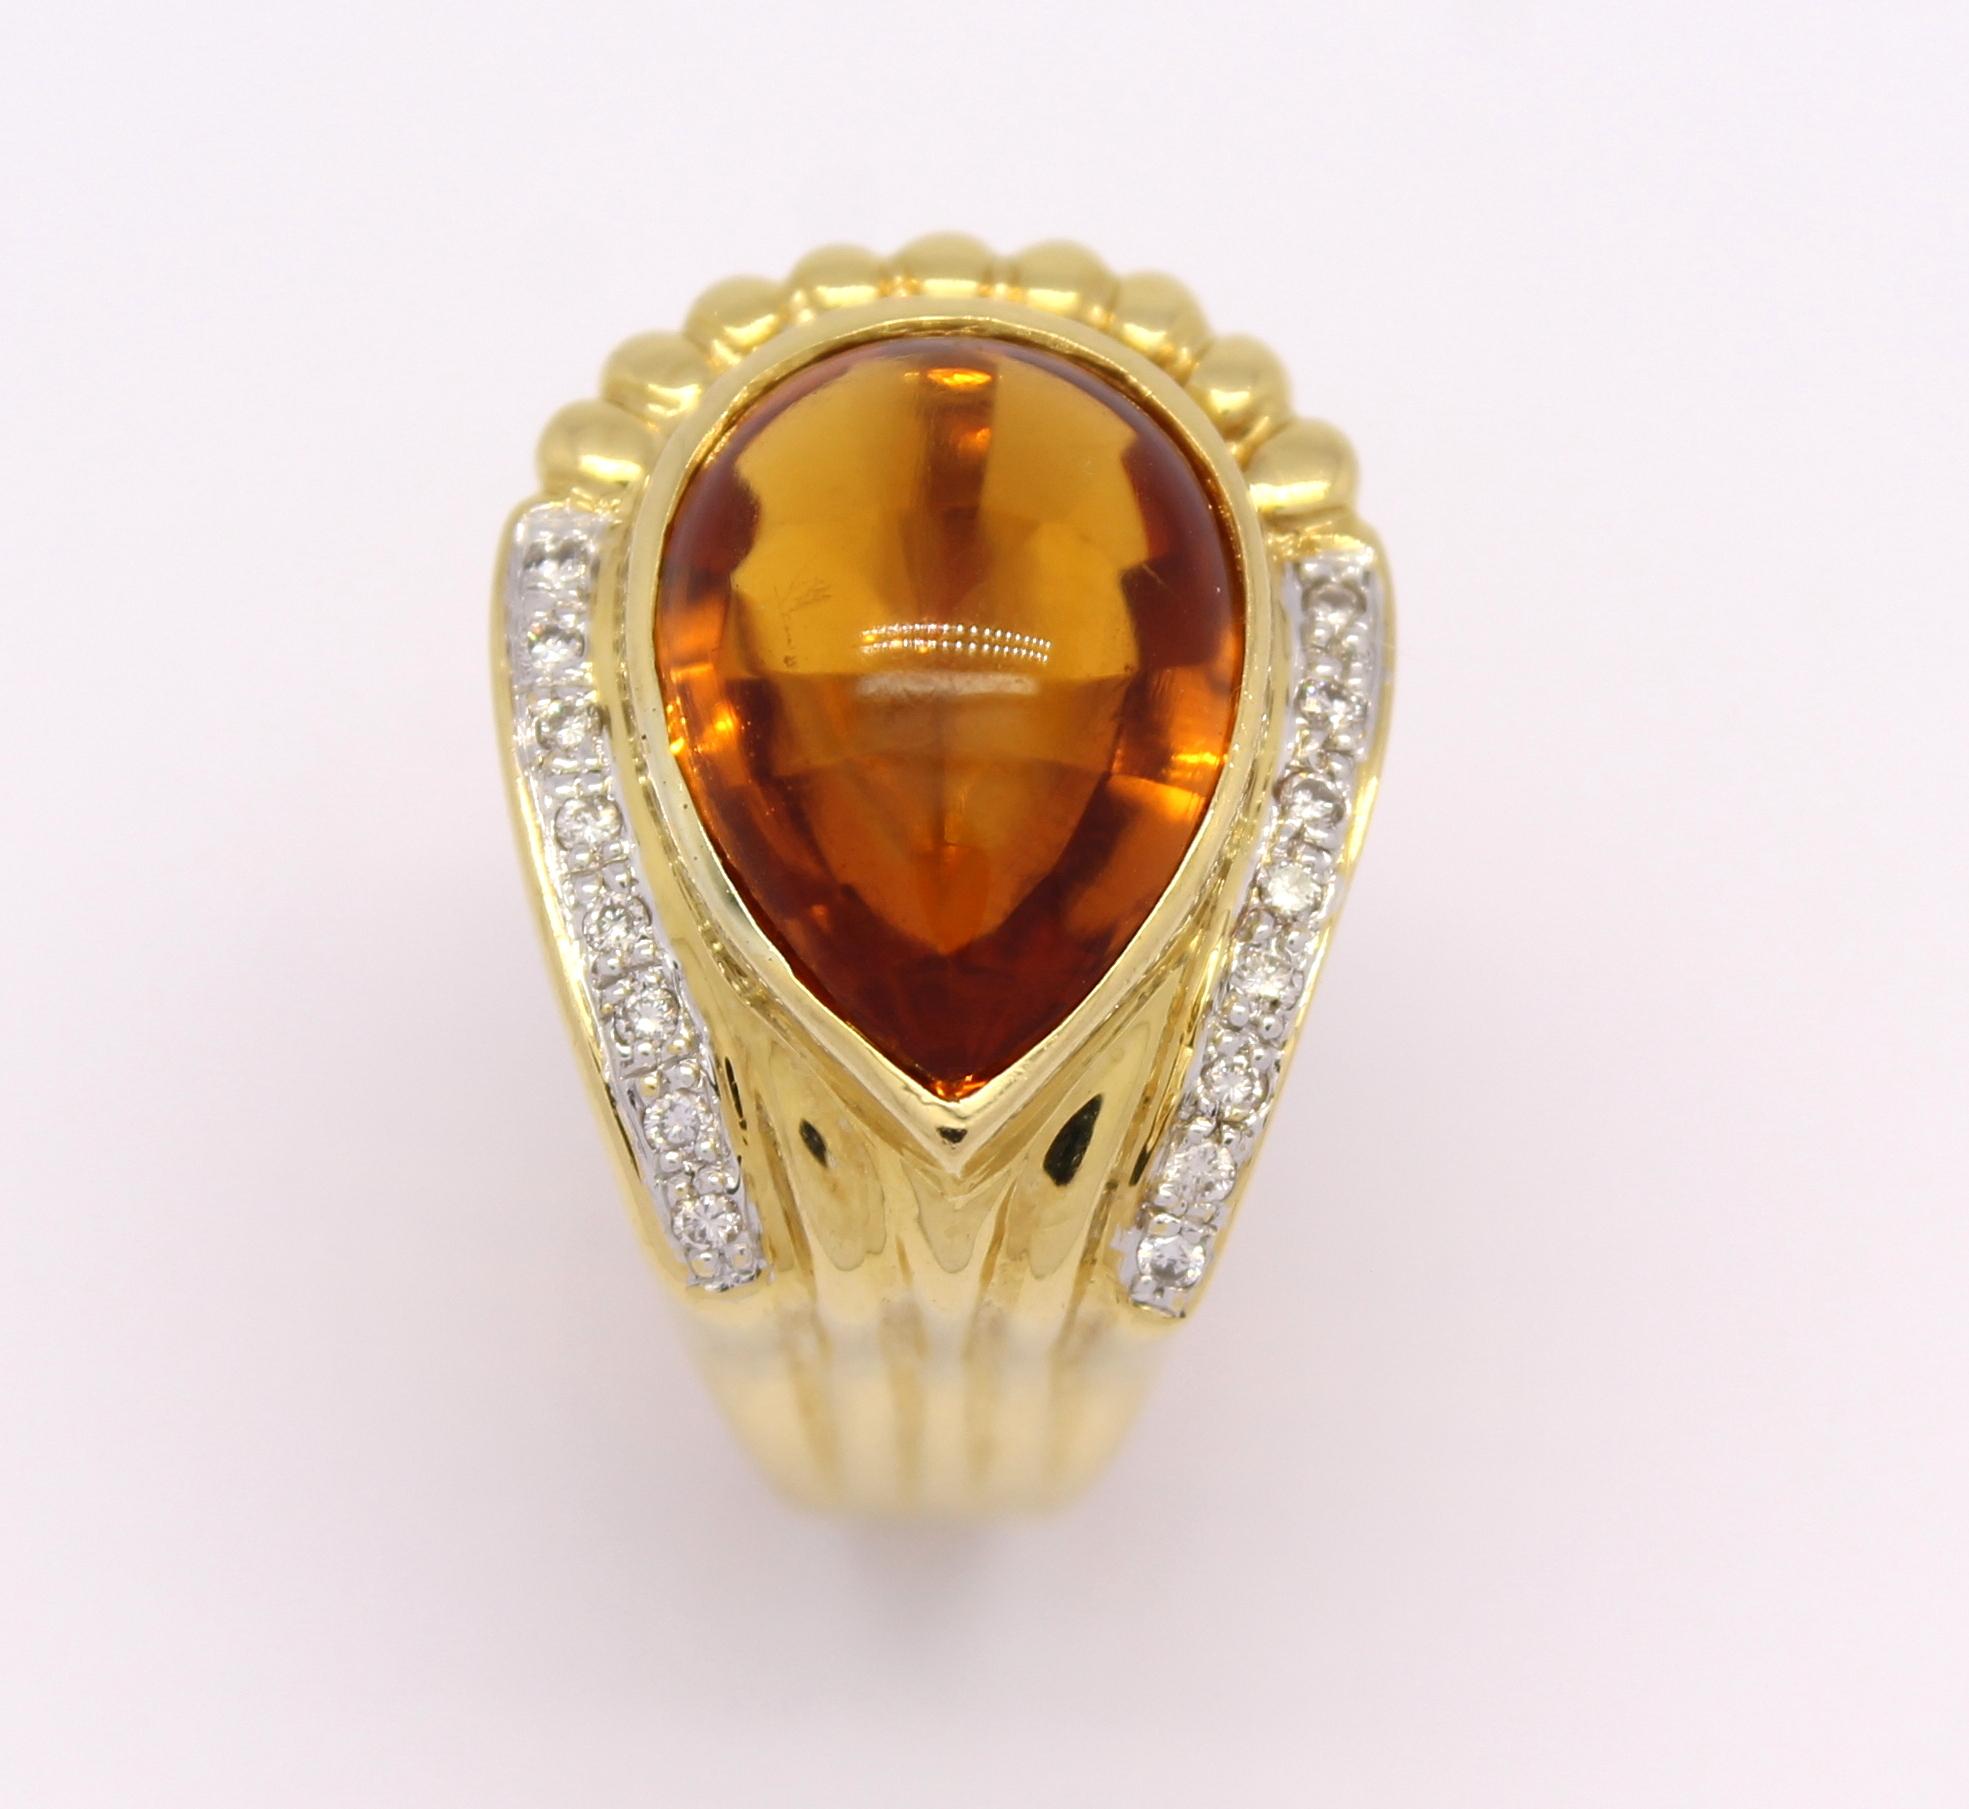 Anel Gota Topázio Amarelo Diamantes Ouro Amarelo 18k 750 - Marcio ... d79e7542d1